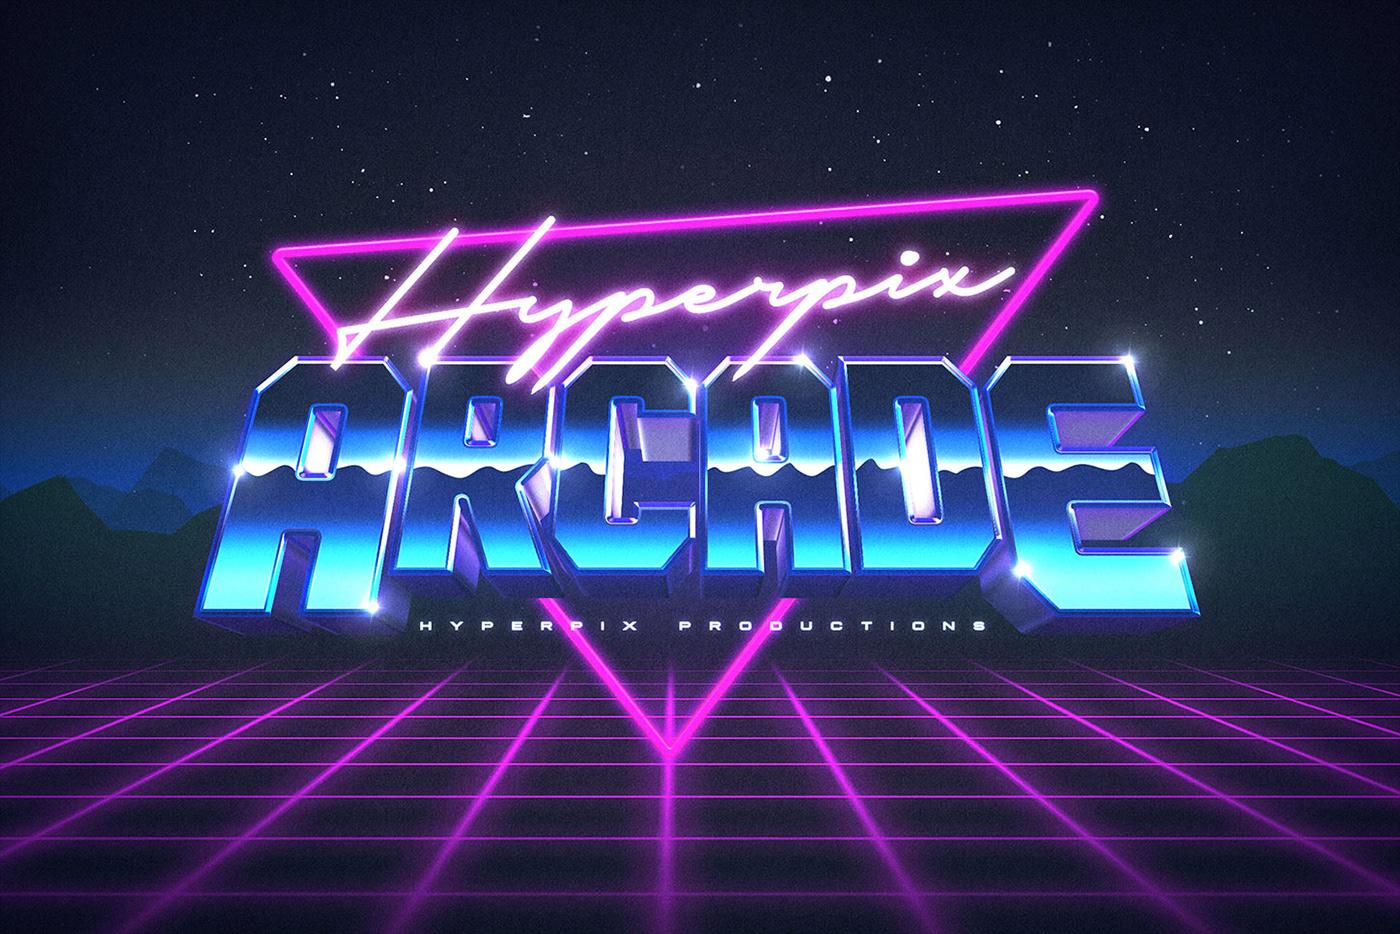 Hyperpix Productions